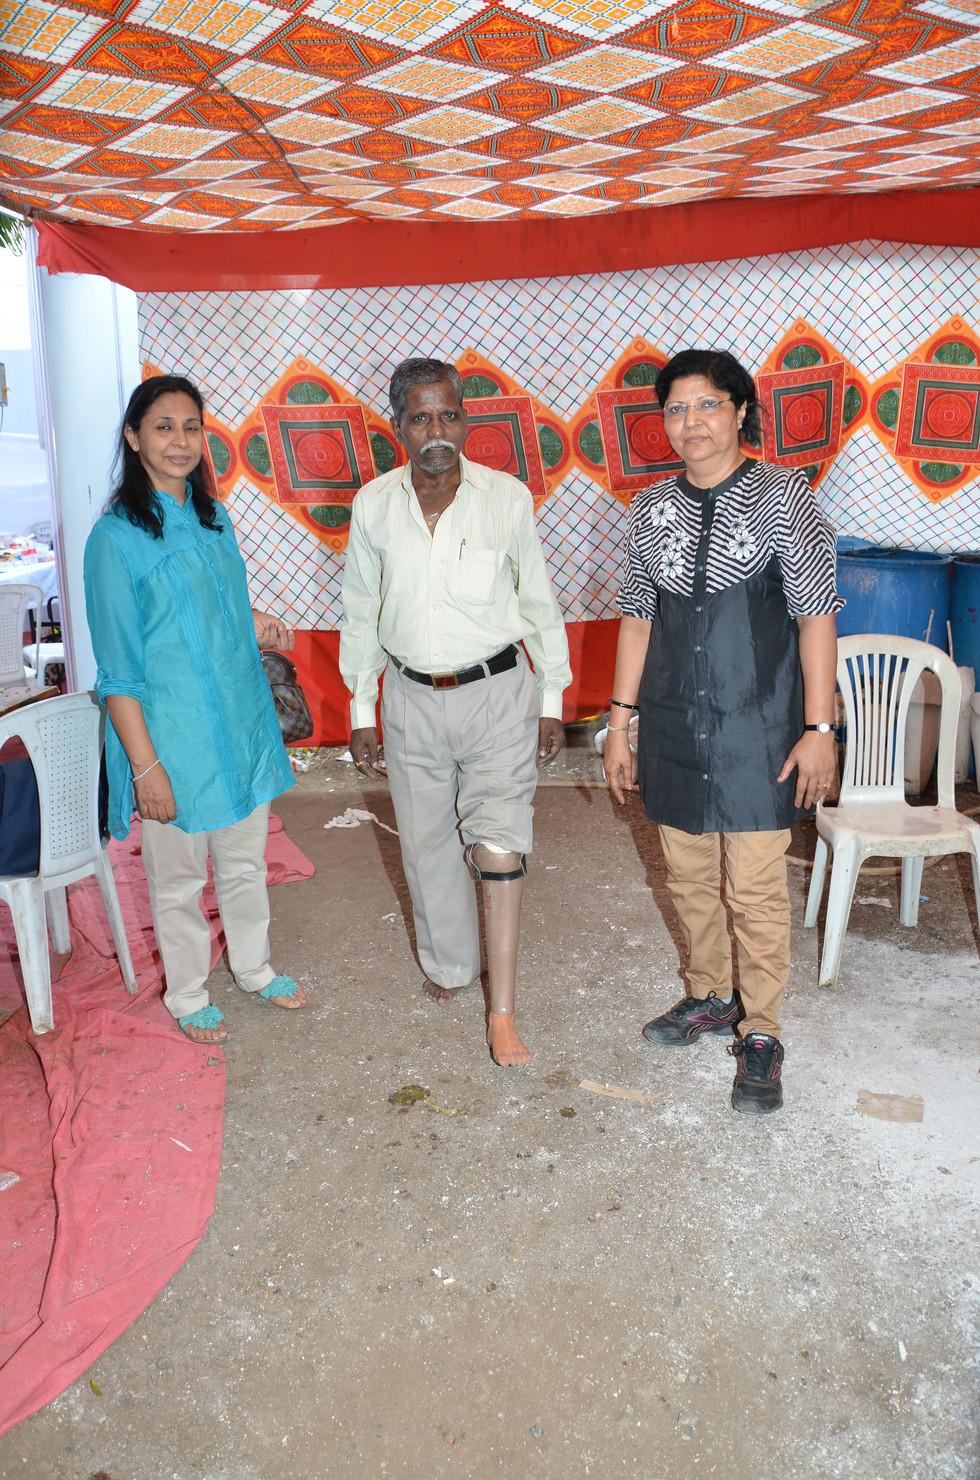 16. A happy recipiant of the jaipur foot.jpg